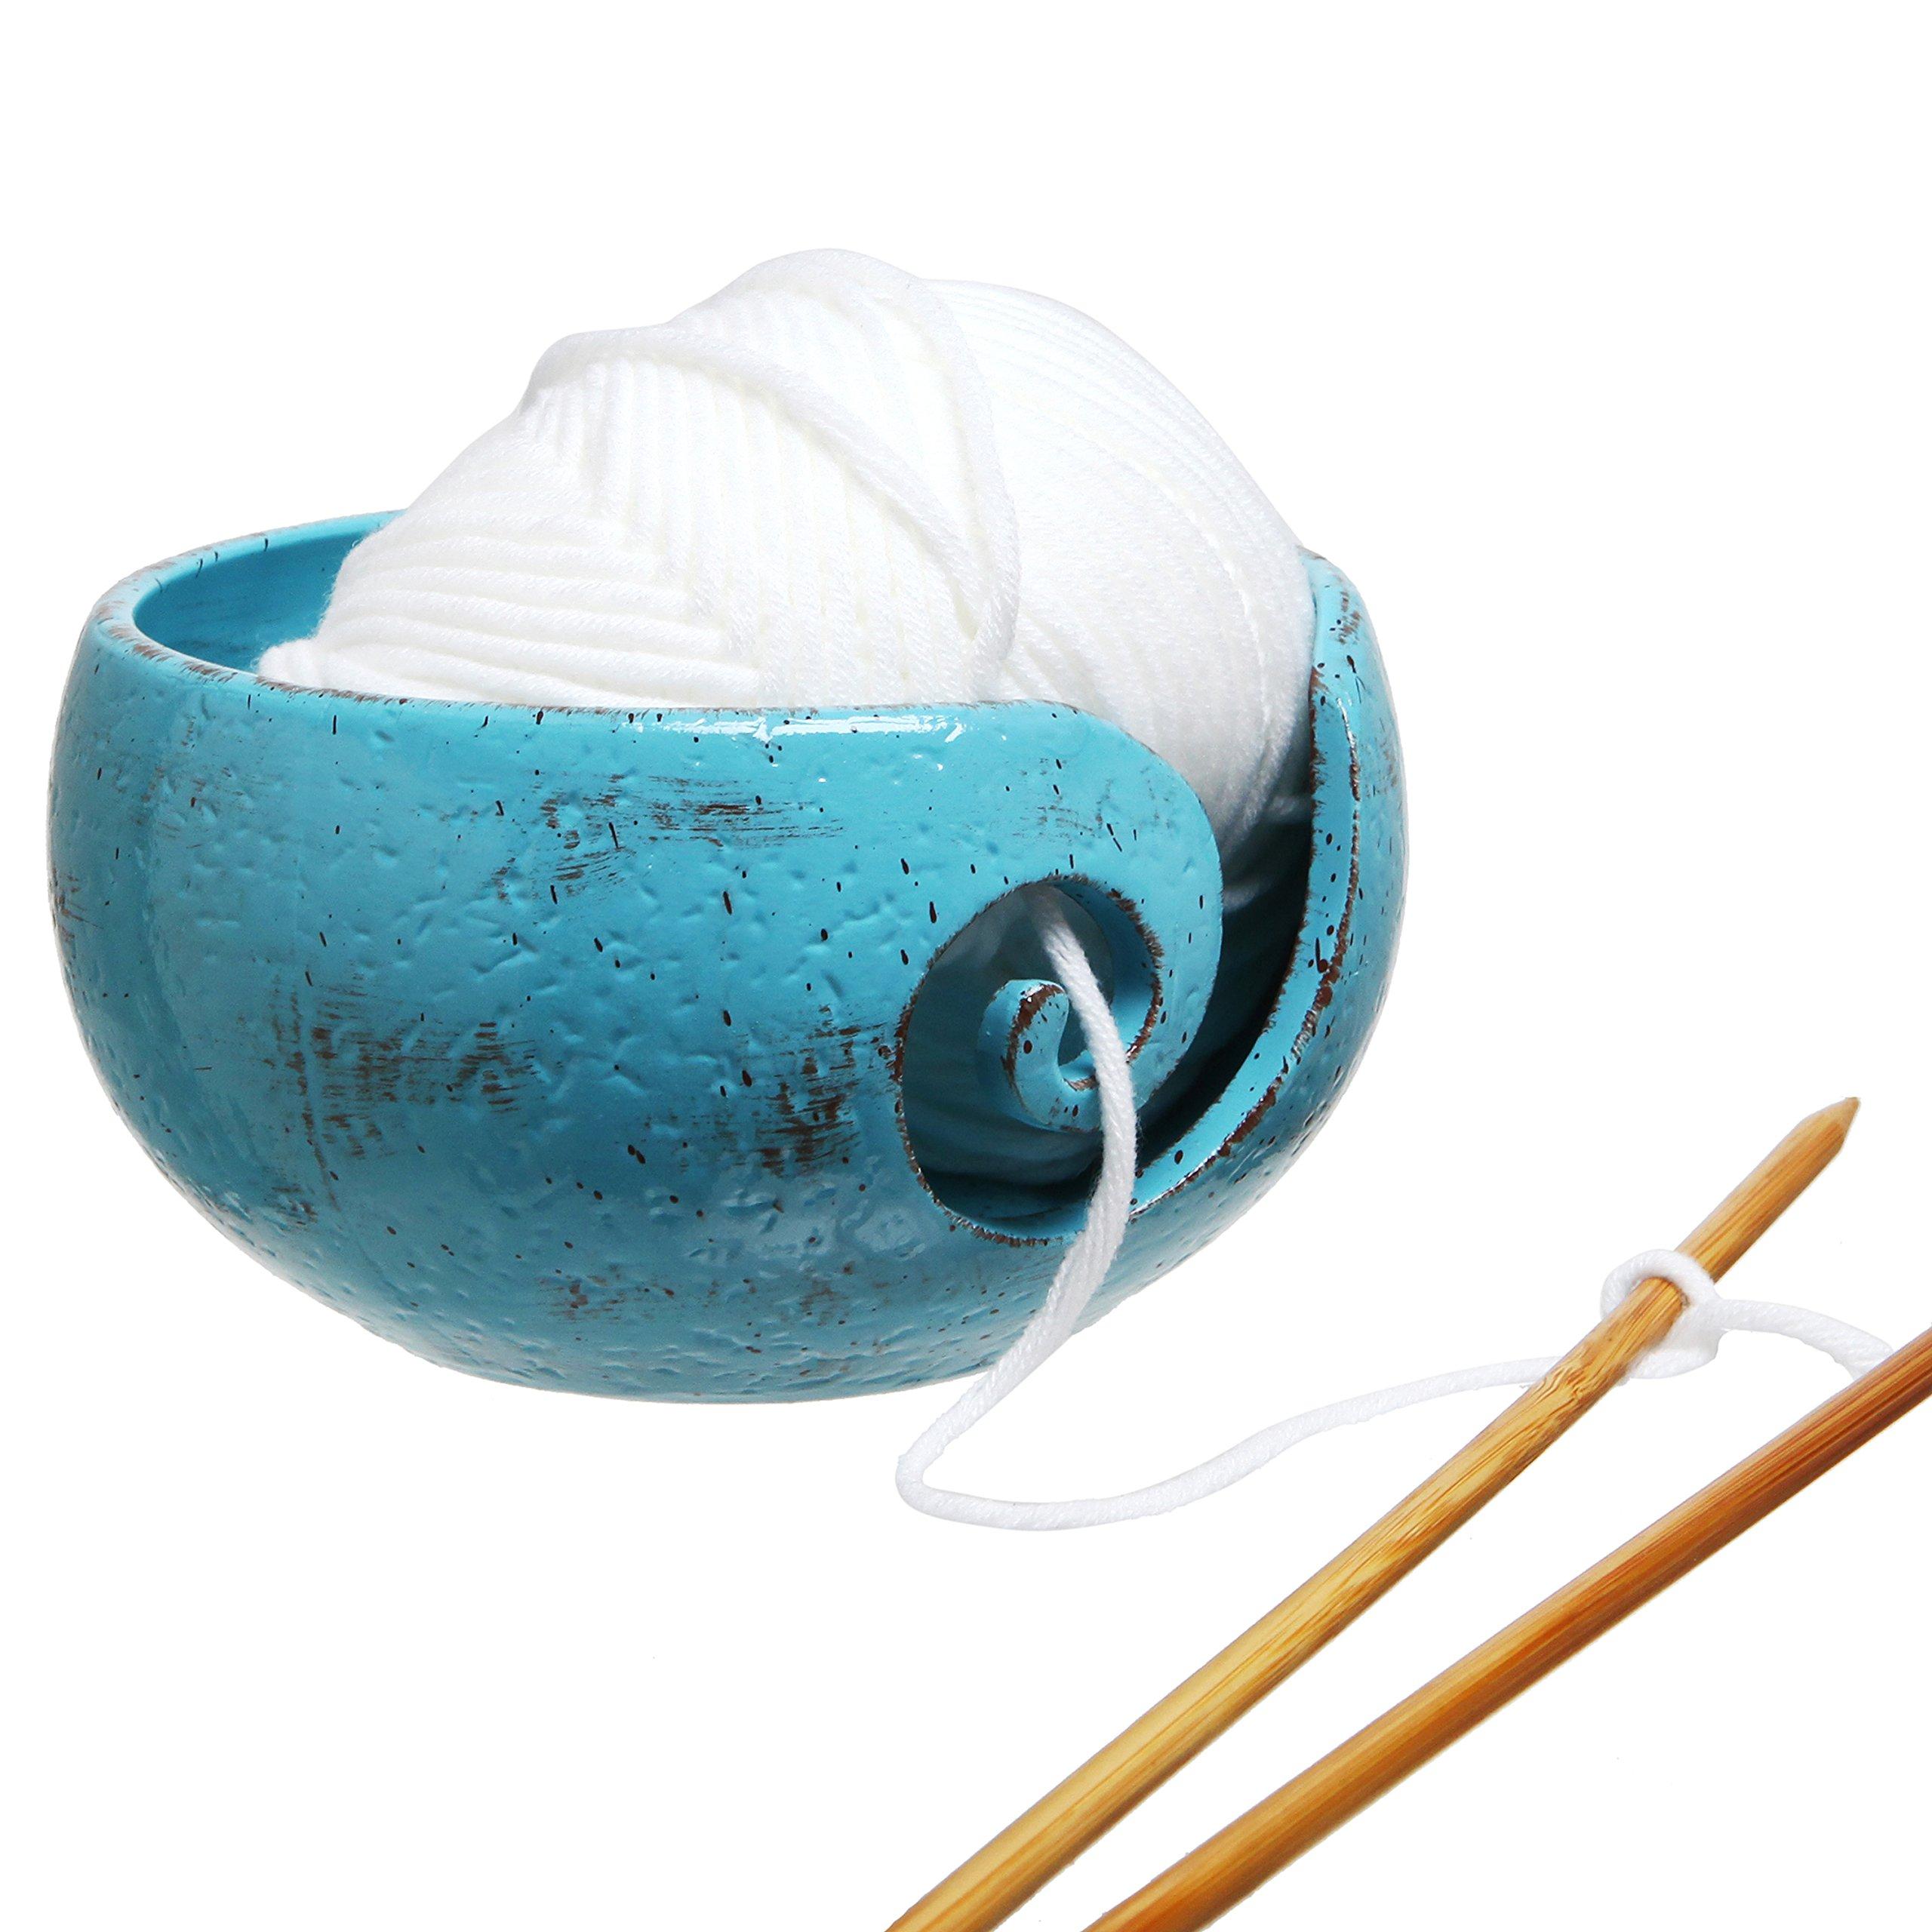 Rustic Handcrafted Ceramic Knitting Yarn Bowl Holder with Elegant Swirl Design, Turquoise